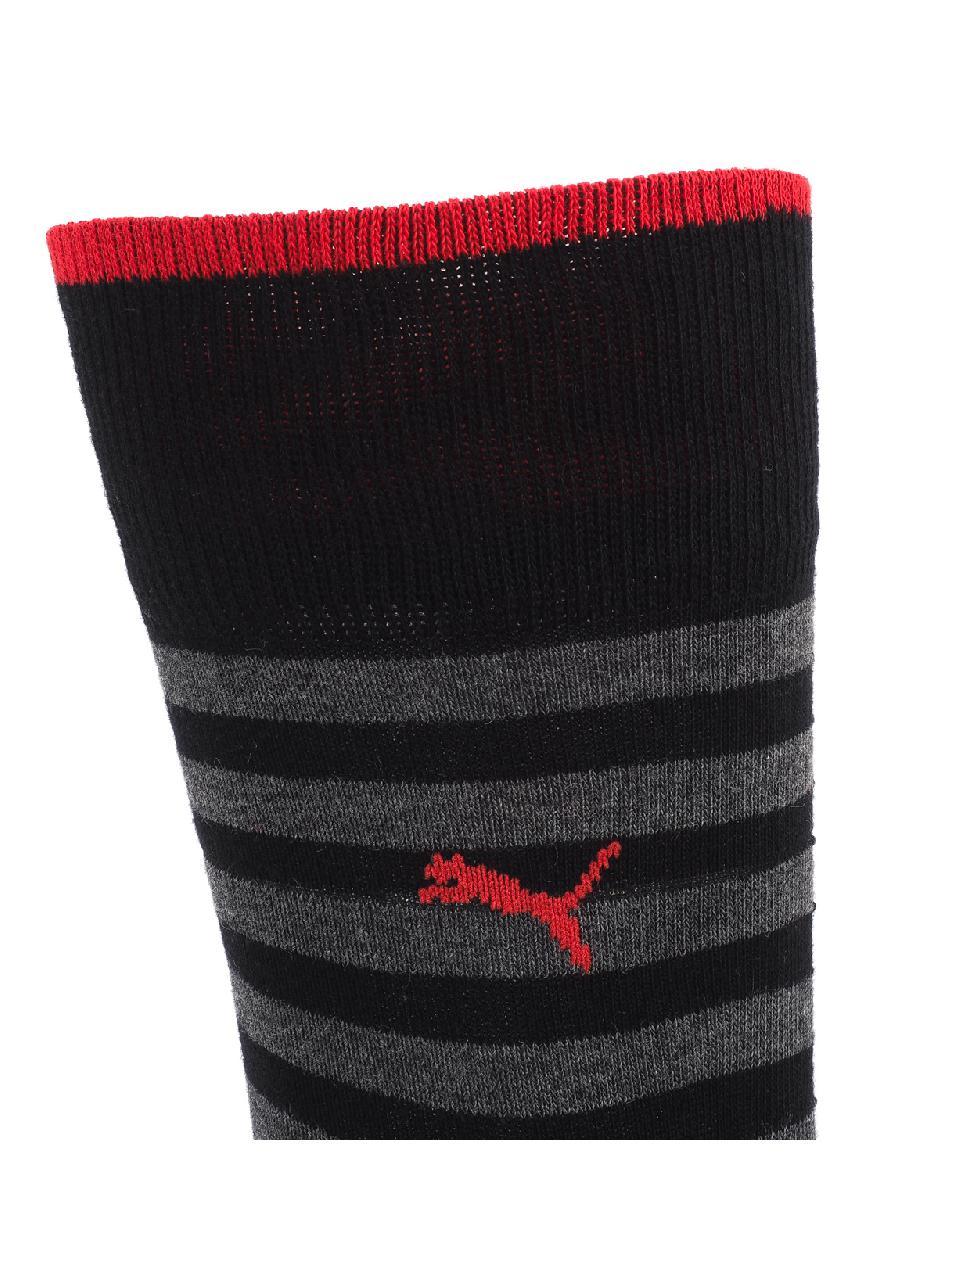 Chaussettes-Puma-Classic-black-stripes-x2-Noir-57037-Neuf miniature 3